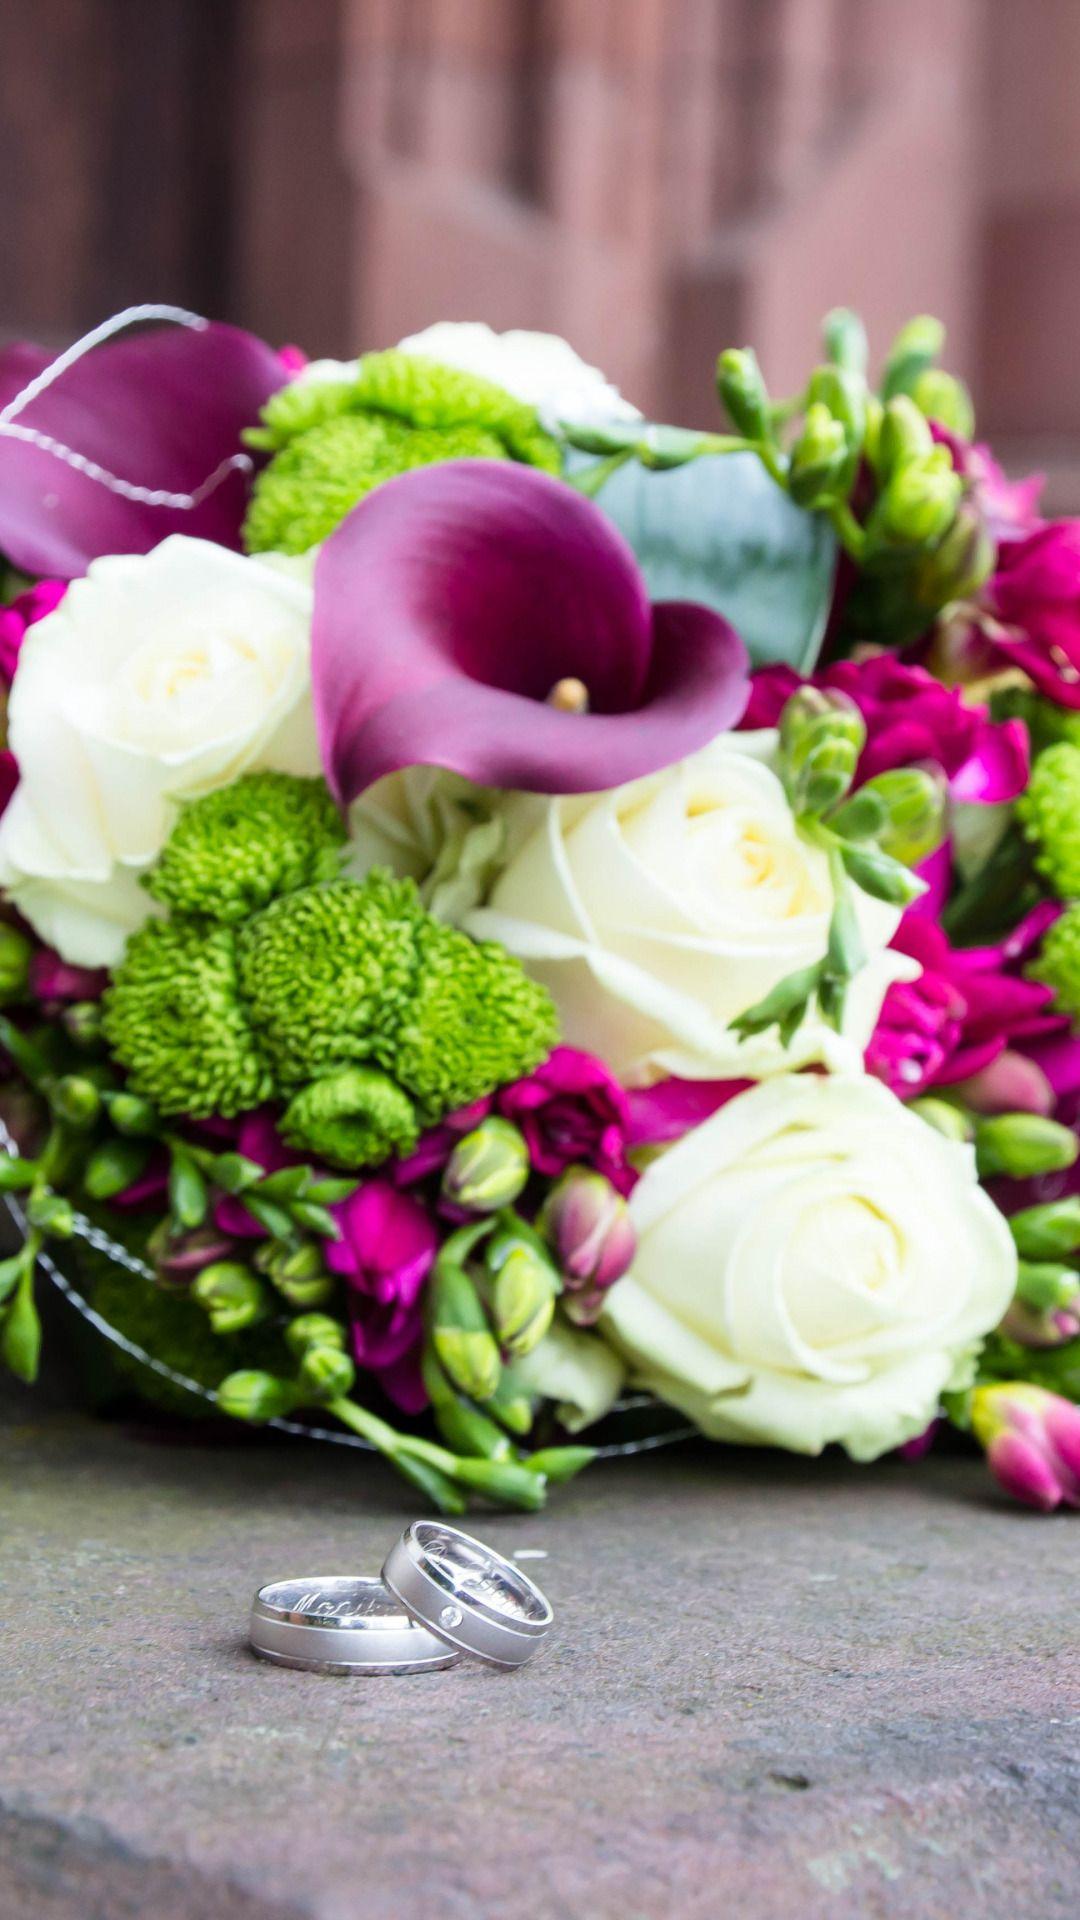 Wallpapers For Desktop Flowers, Roses, Bouquet, Rings, Wedding, Flowers, Rose